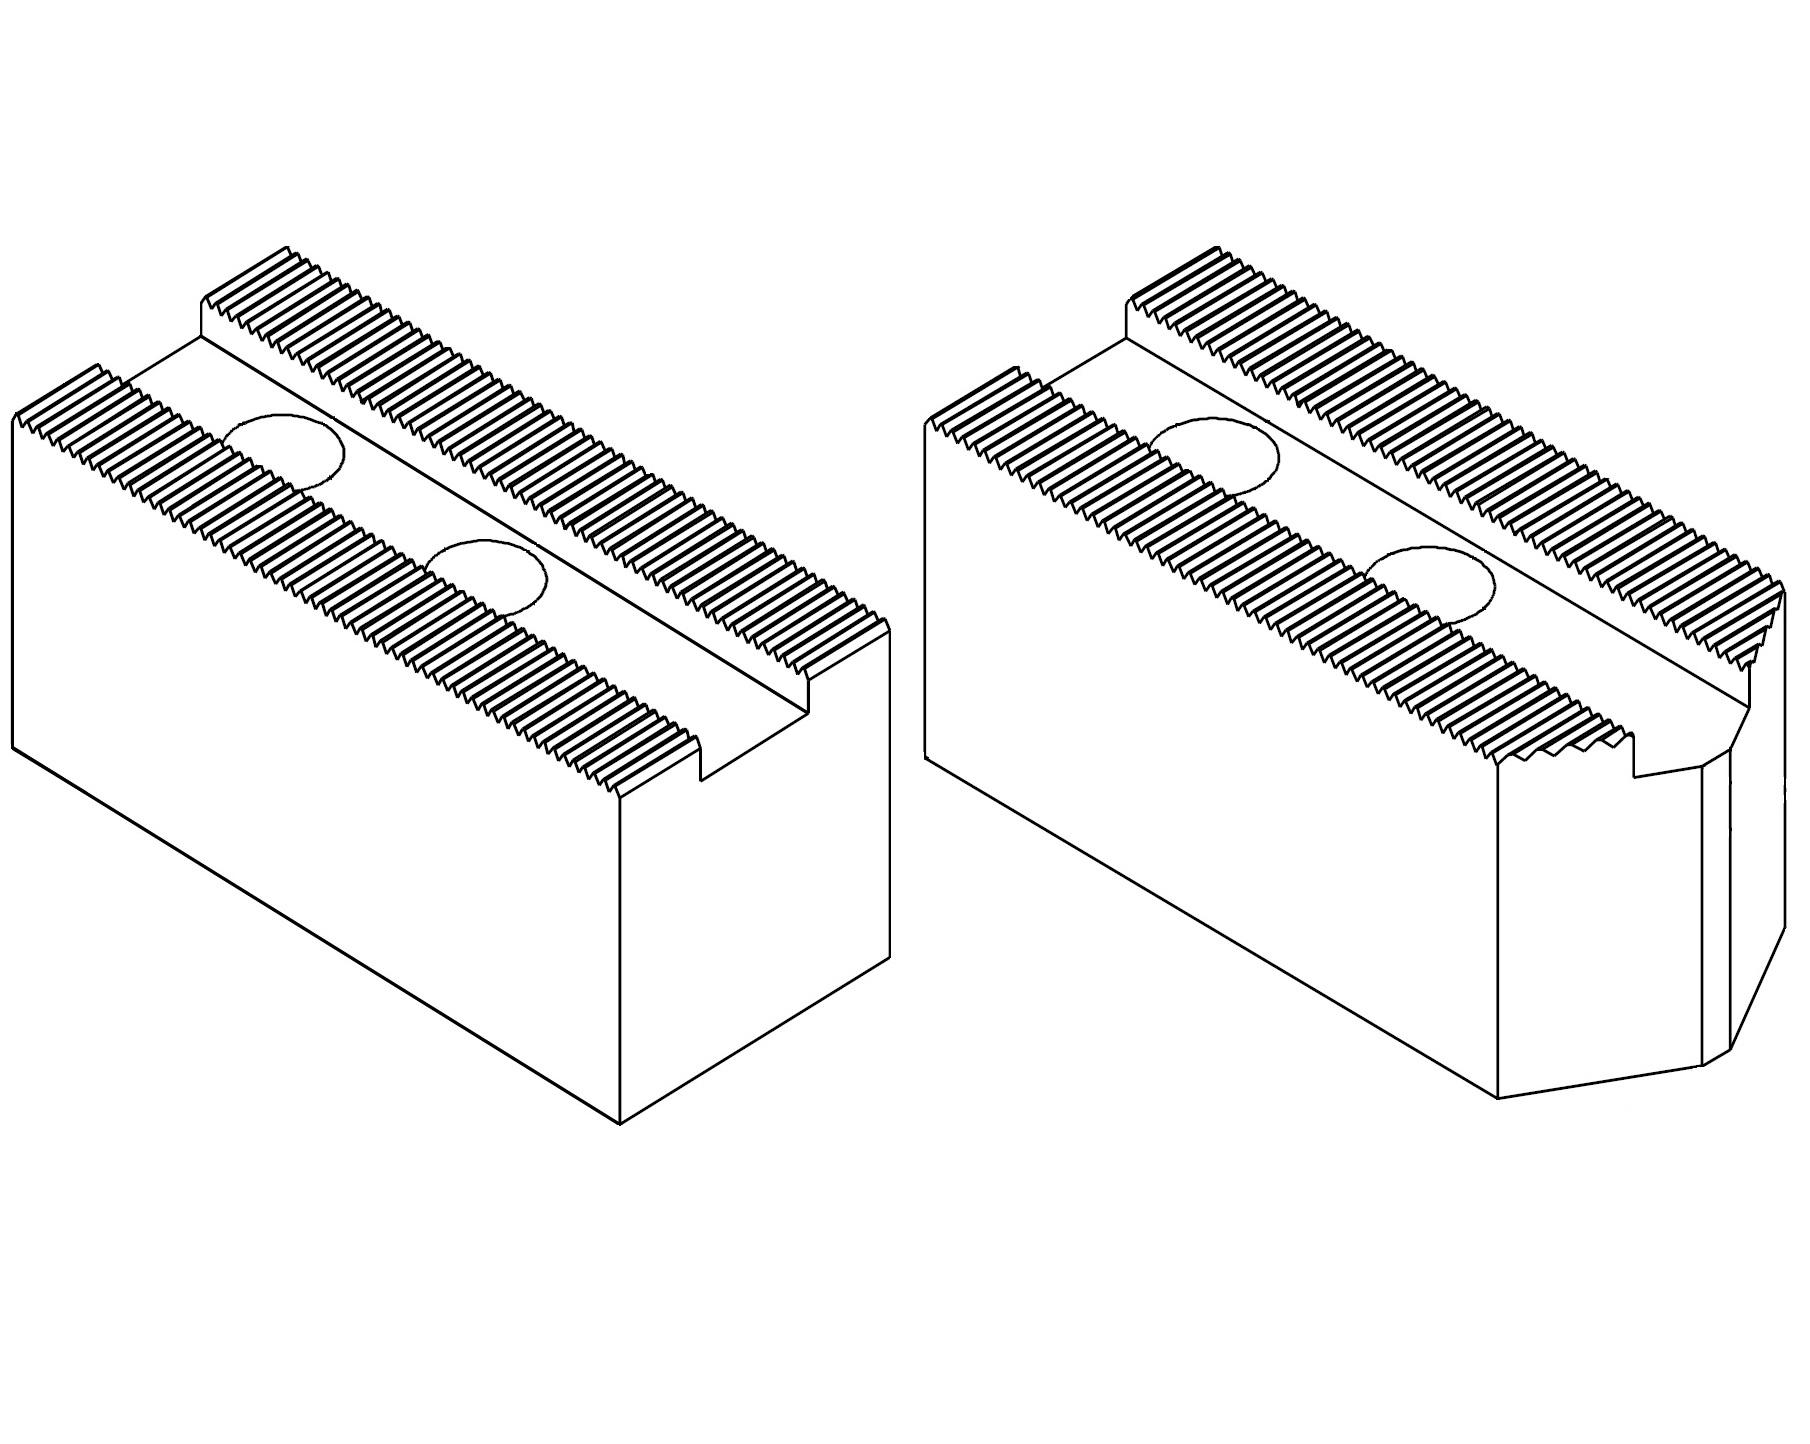 Čelisti měkké 1,5x60°, šířka drážky - 8 (sklíčidla pr. 100mm)